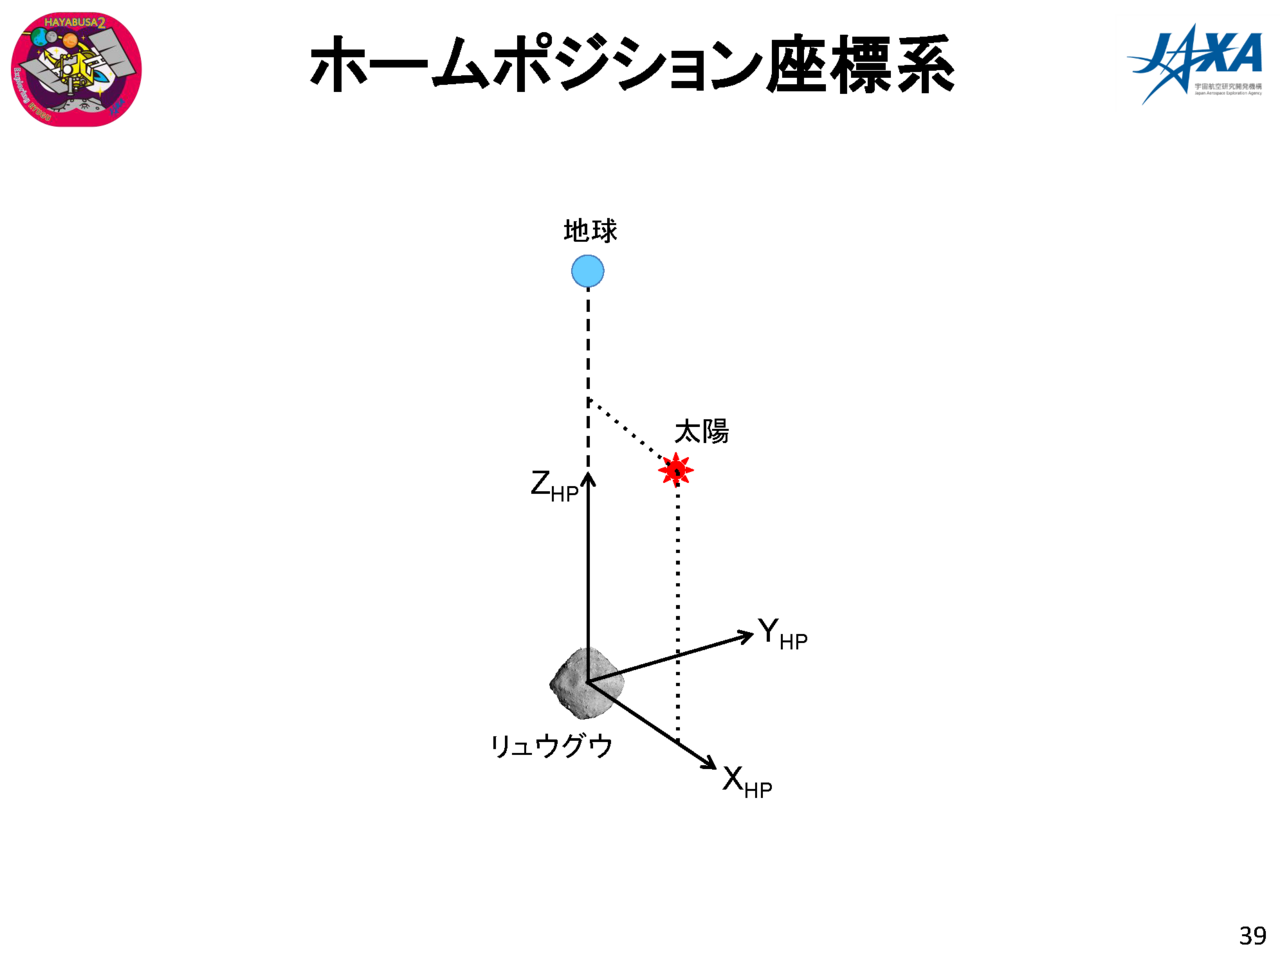 f:id:Imamura:20180719131734p:plain